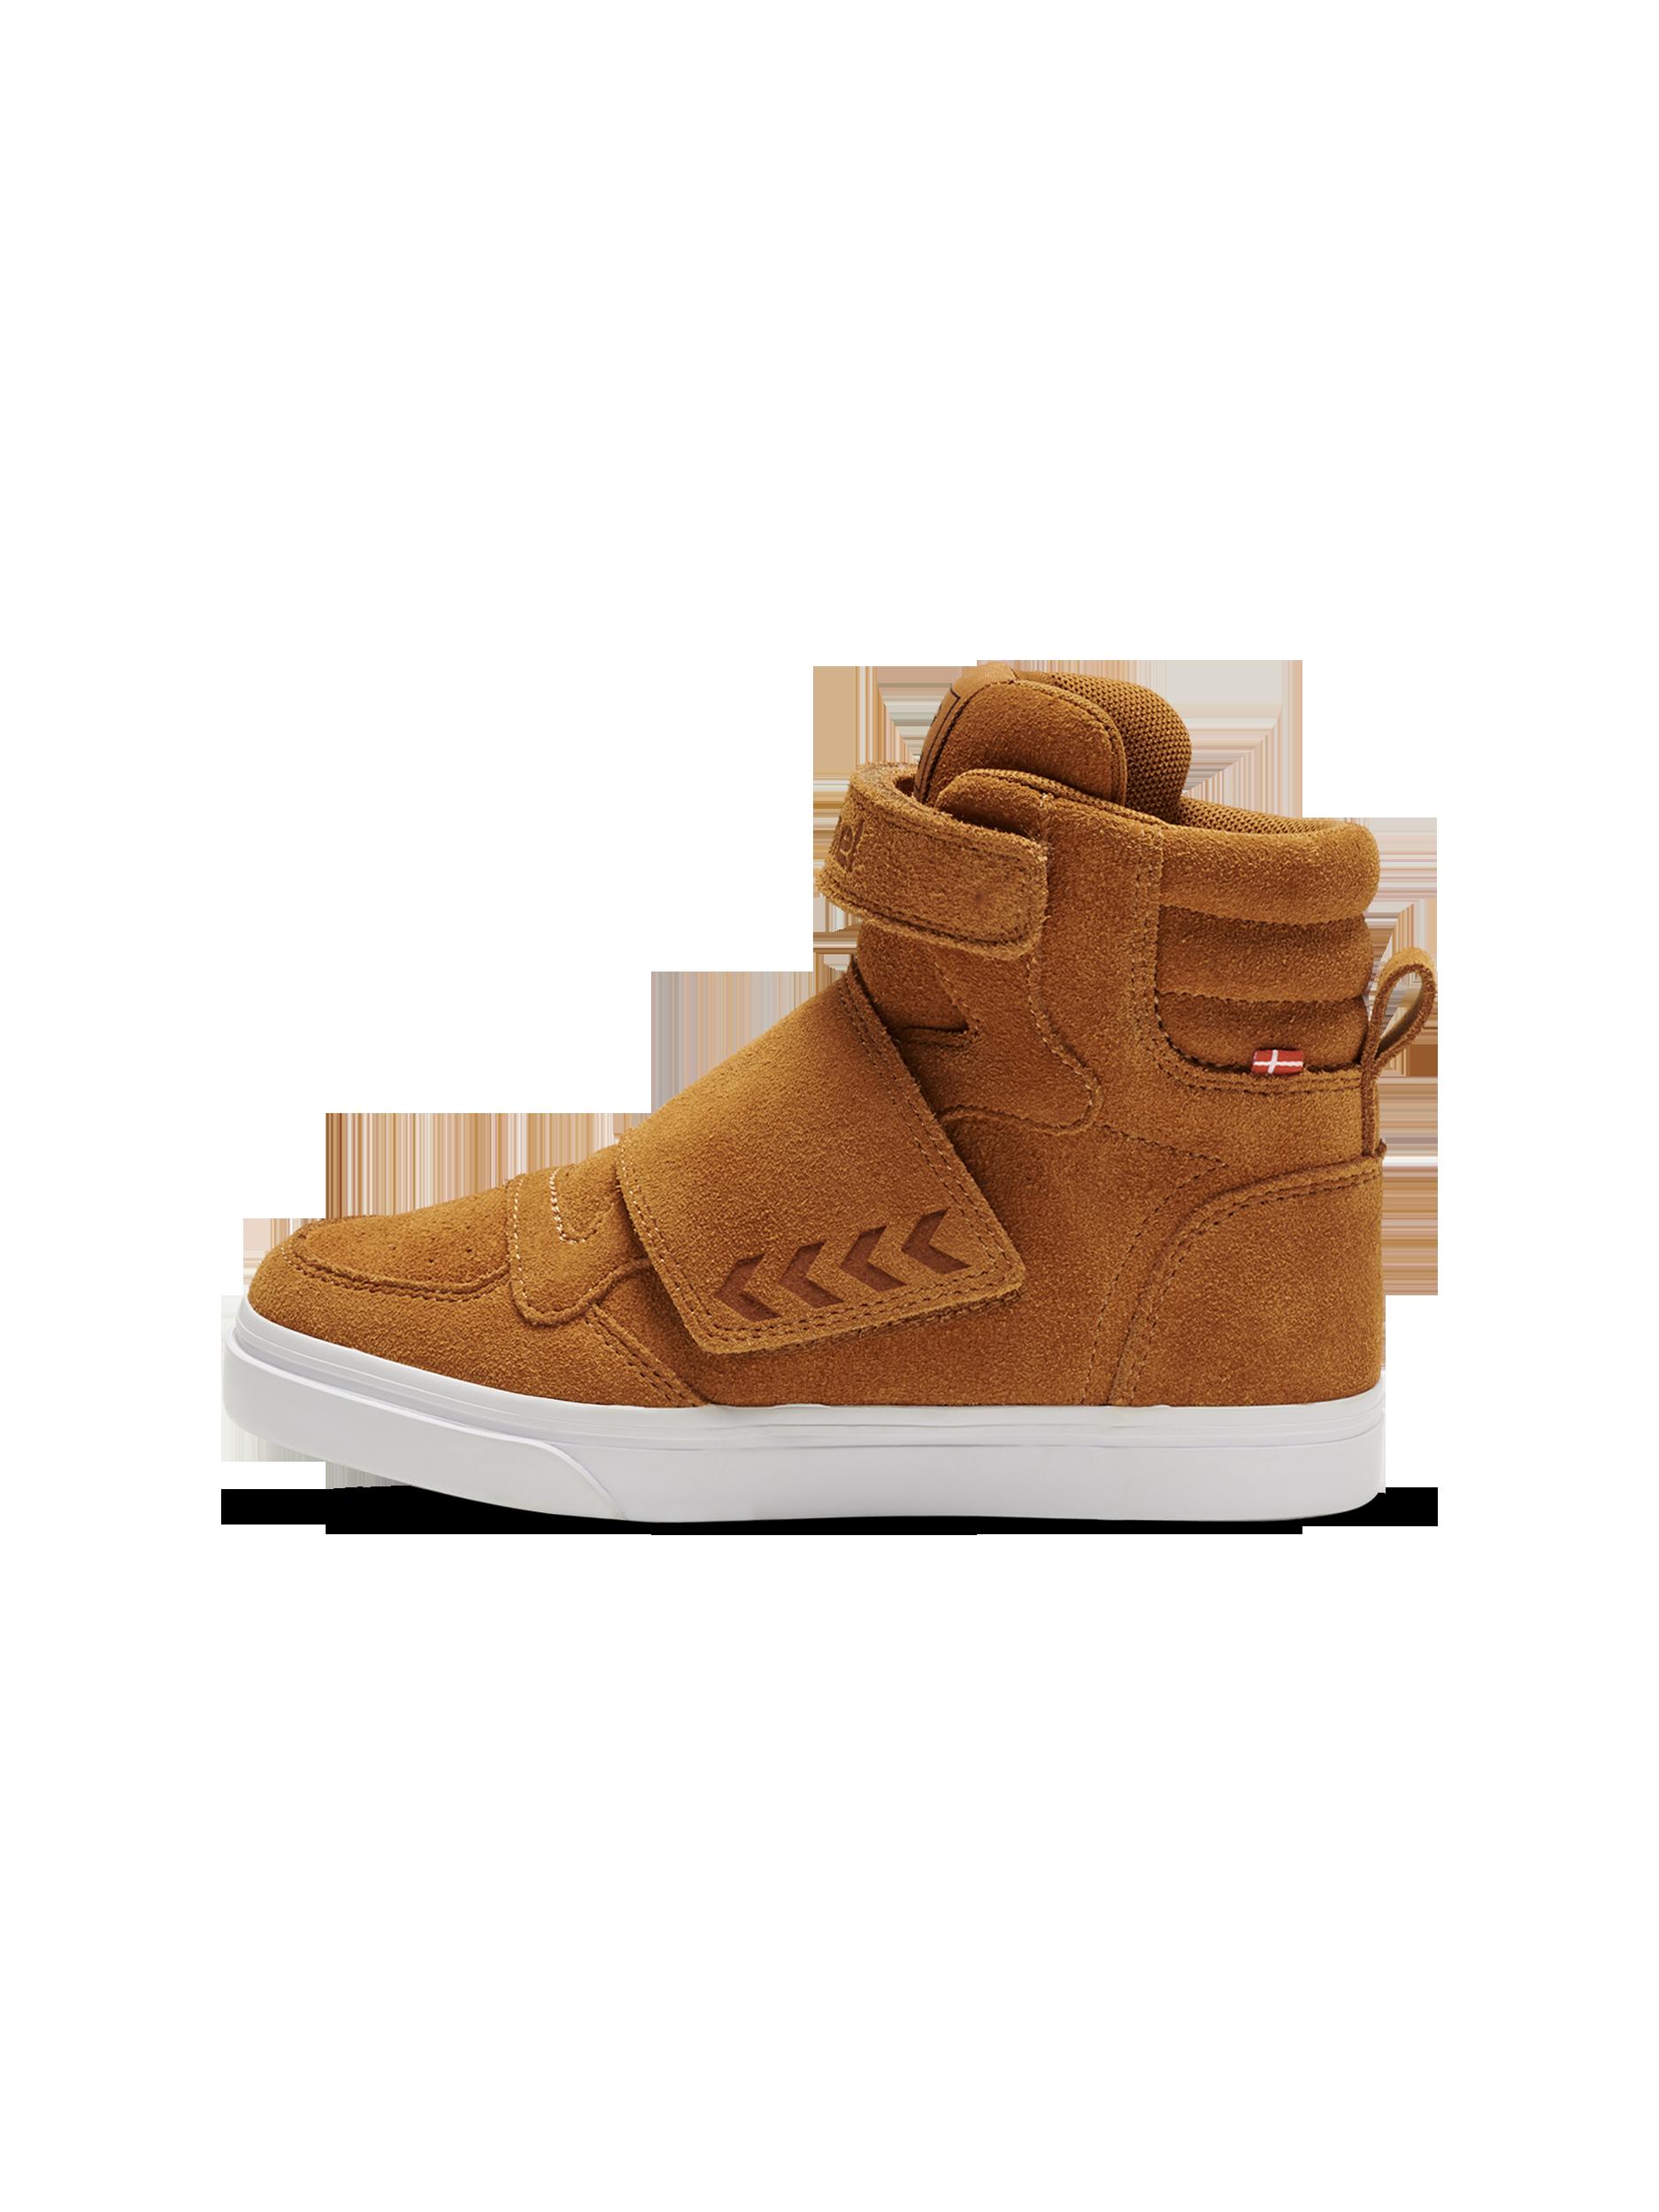 Hummel Stadil Tonal Jr. sneakers, pumpkin spice, 27